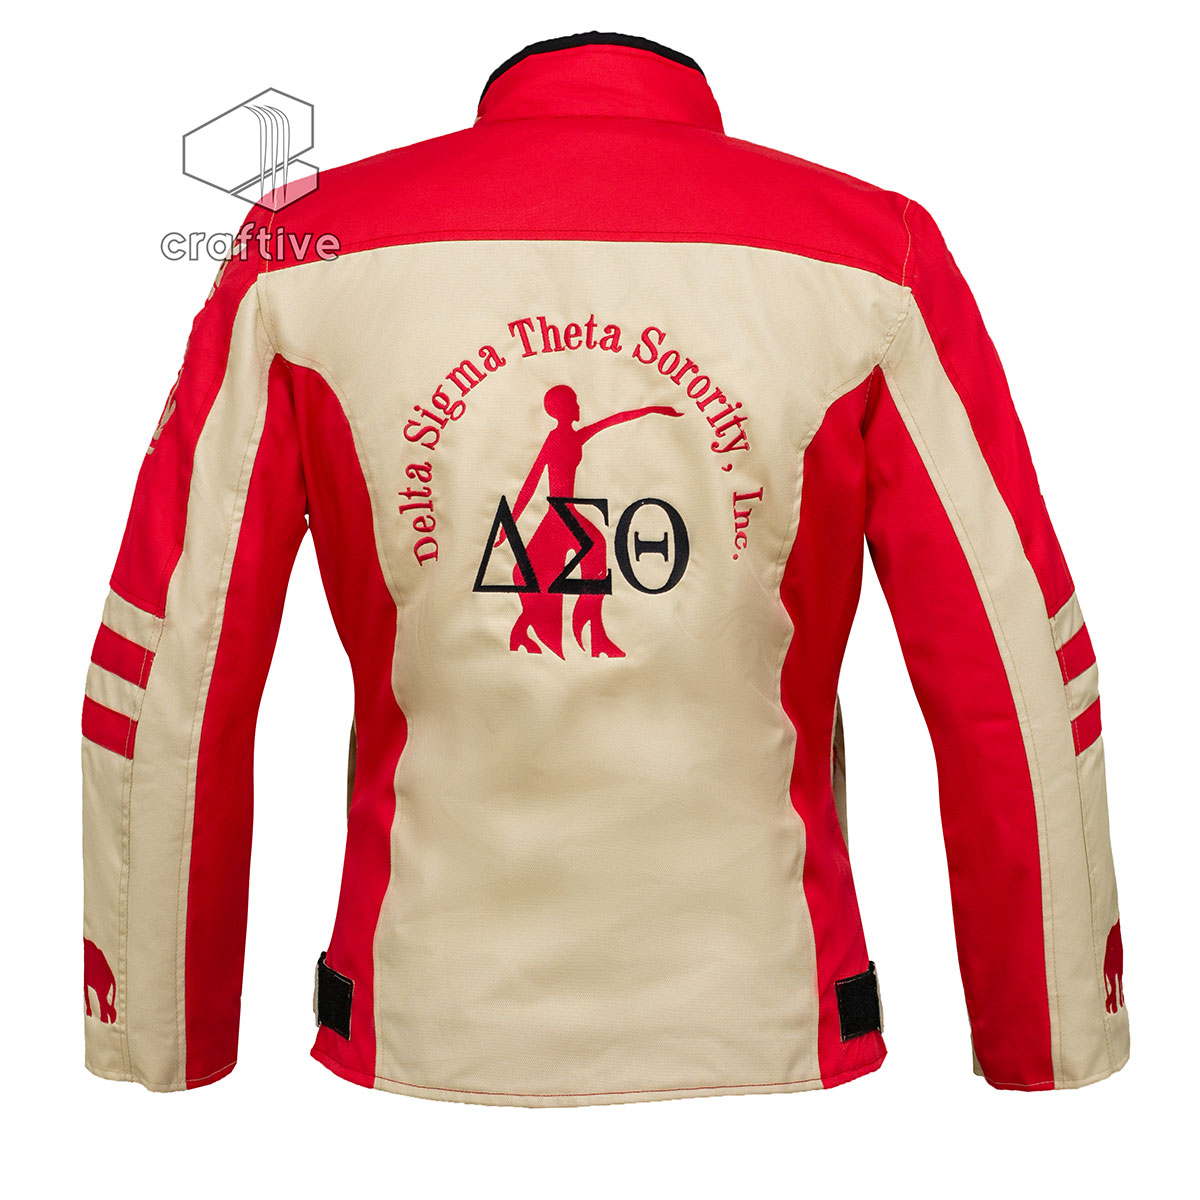 Delta Sigma Theta Crossing Jackets - Craftive Apparels